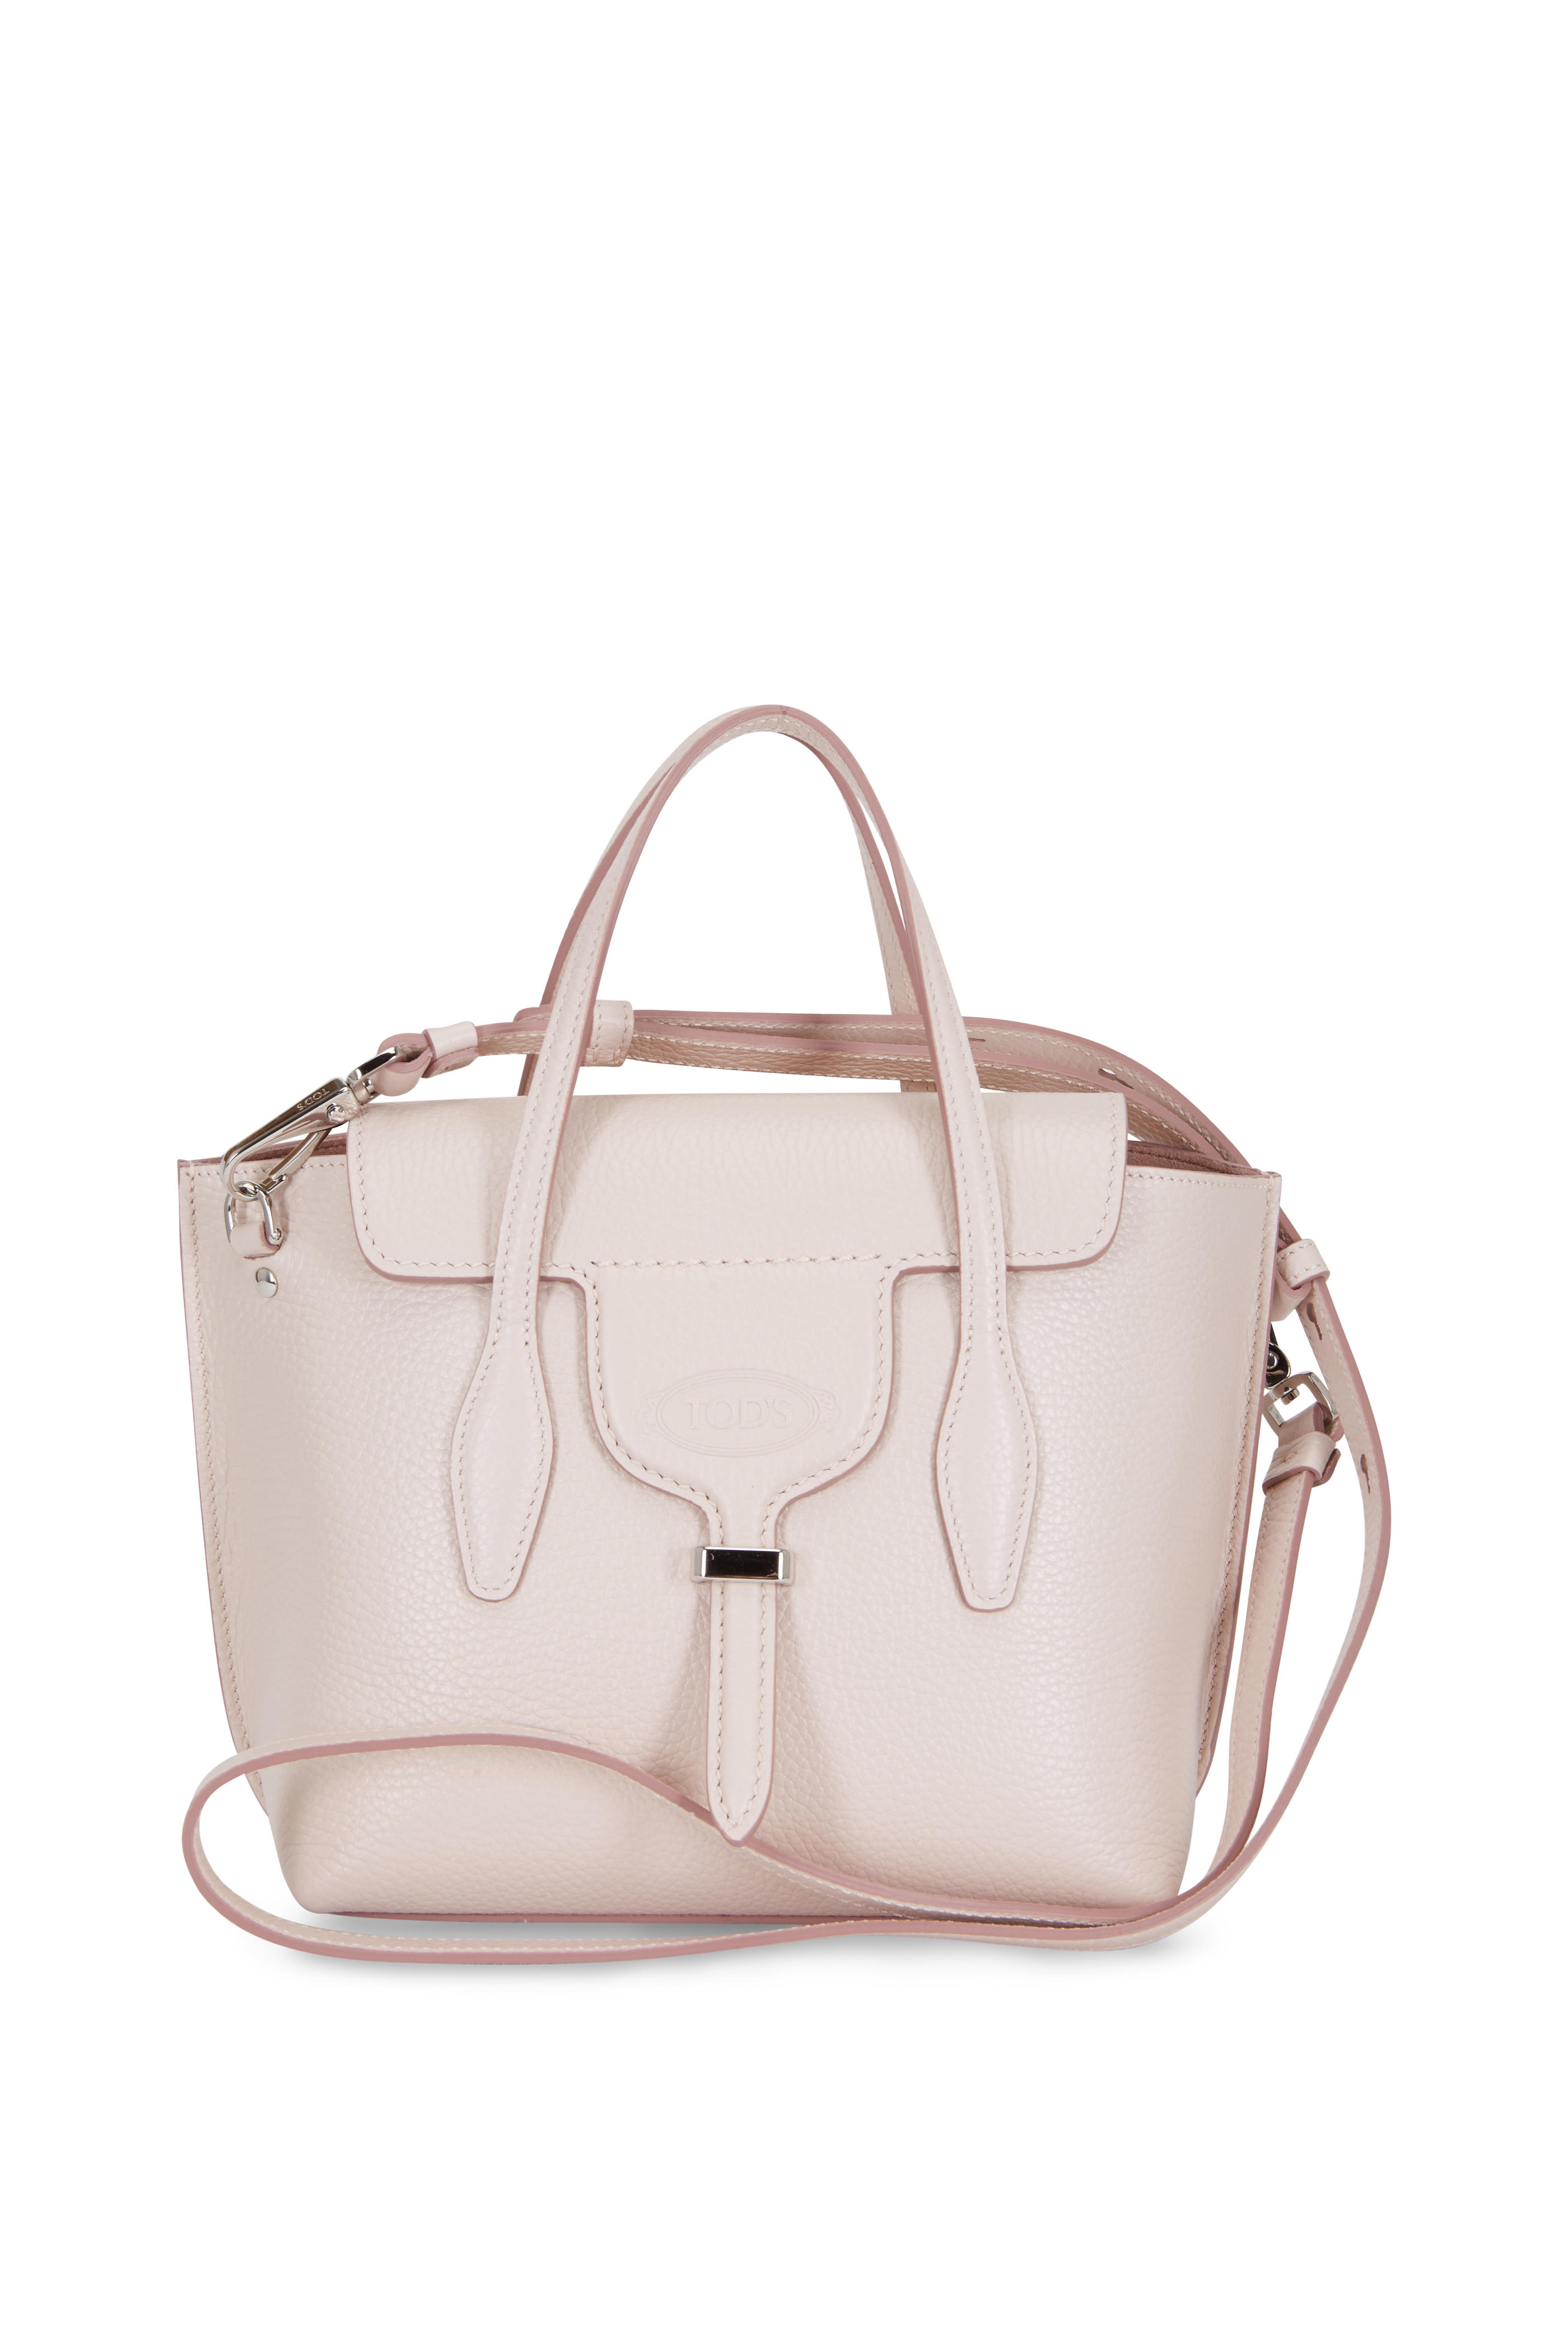 e67b41eaaf Tod's - New Joy Pink Pebbled Leather Mini Hobo Bag | Mitchell Stores